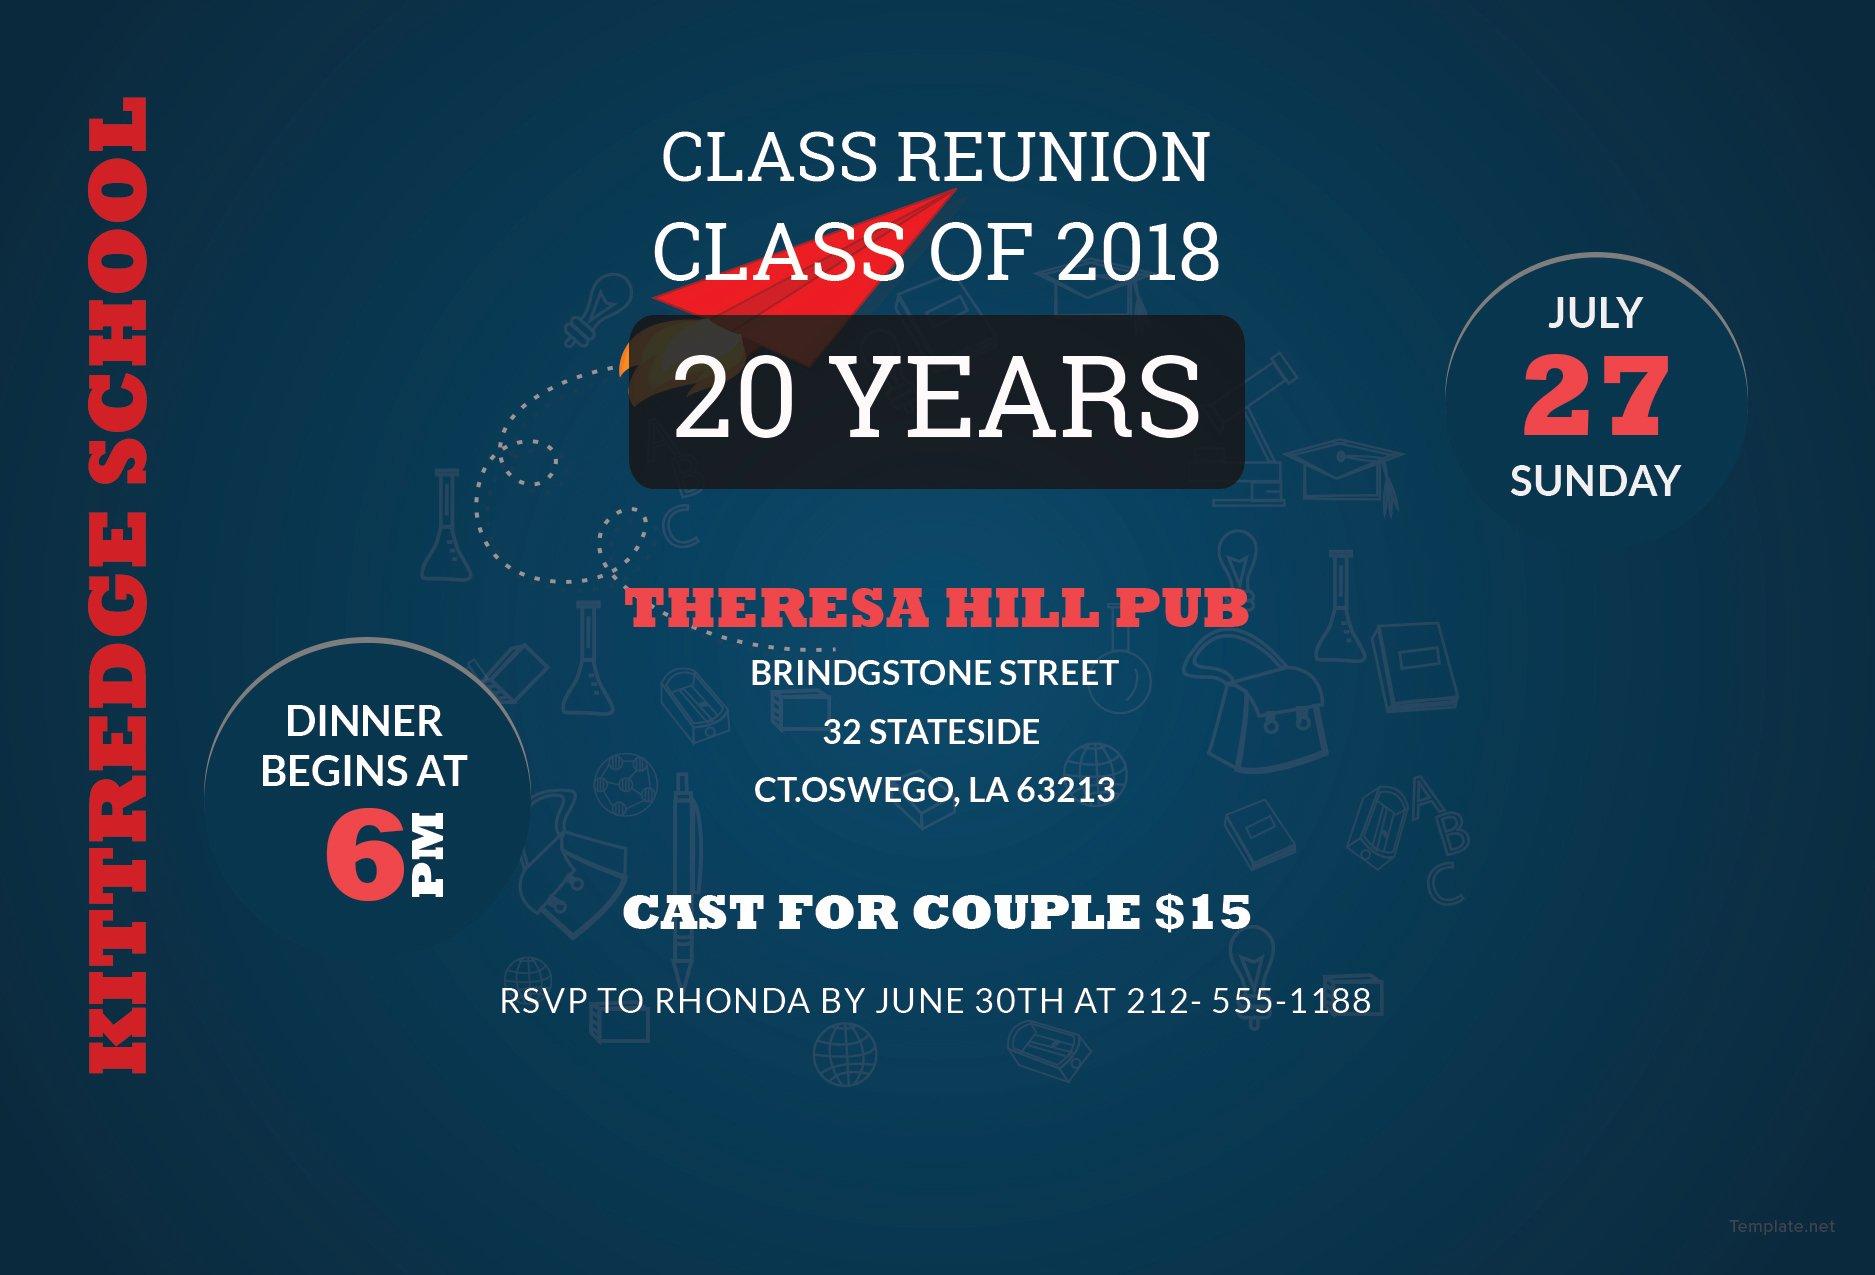 free class reunion invitation template in adobe photoshop